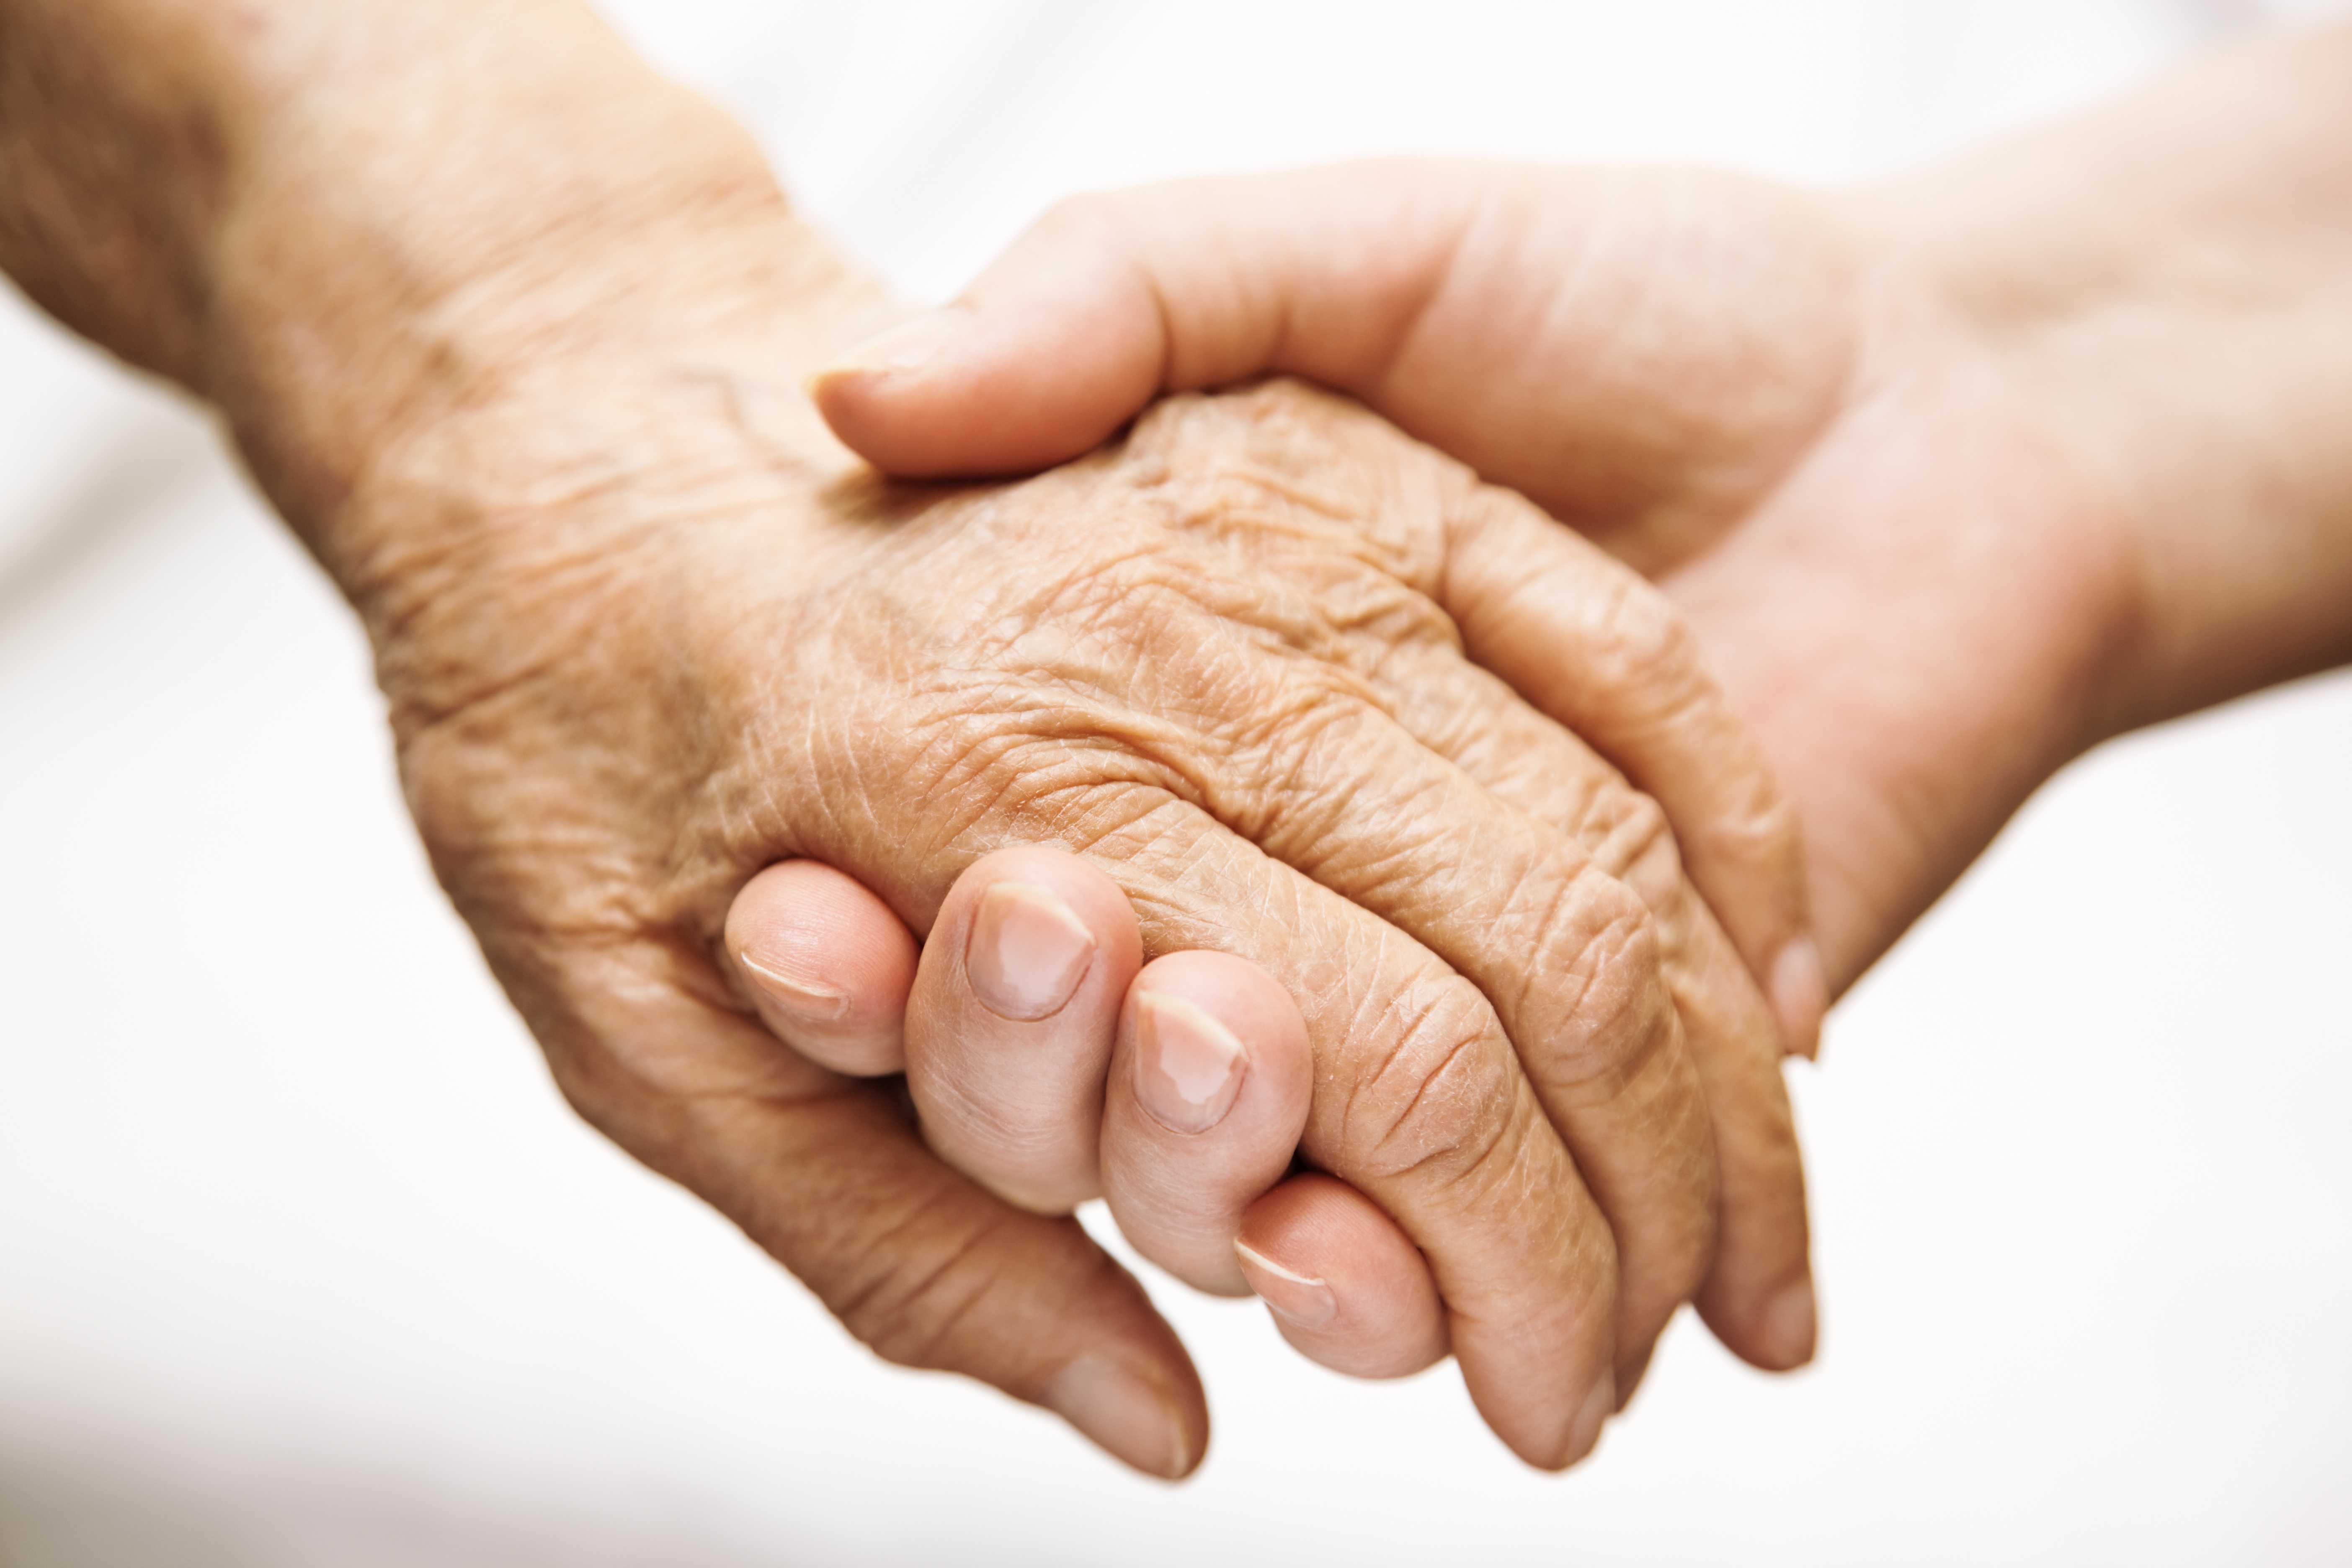 Junger Mensch nimmt Senior an die Hand